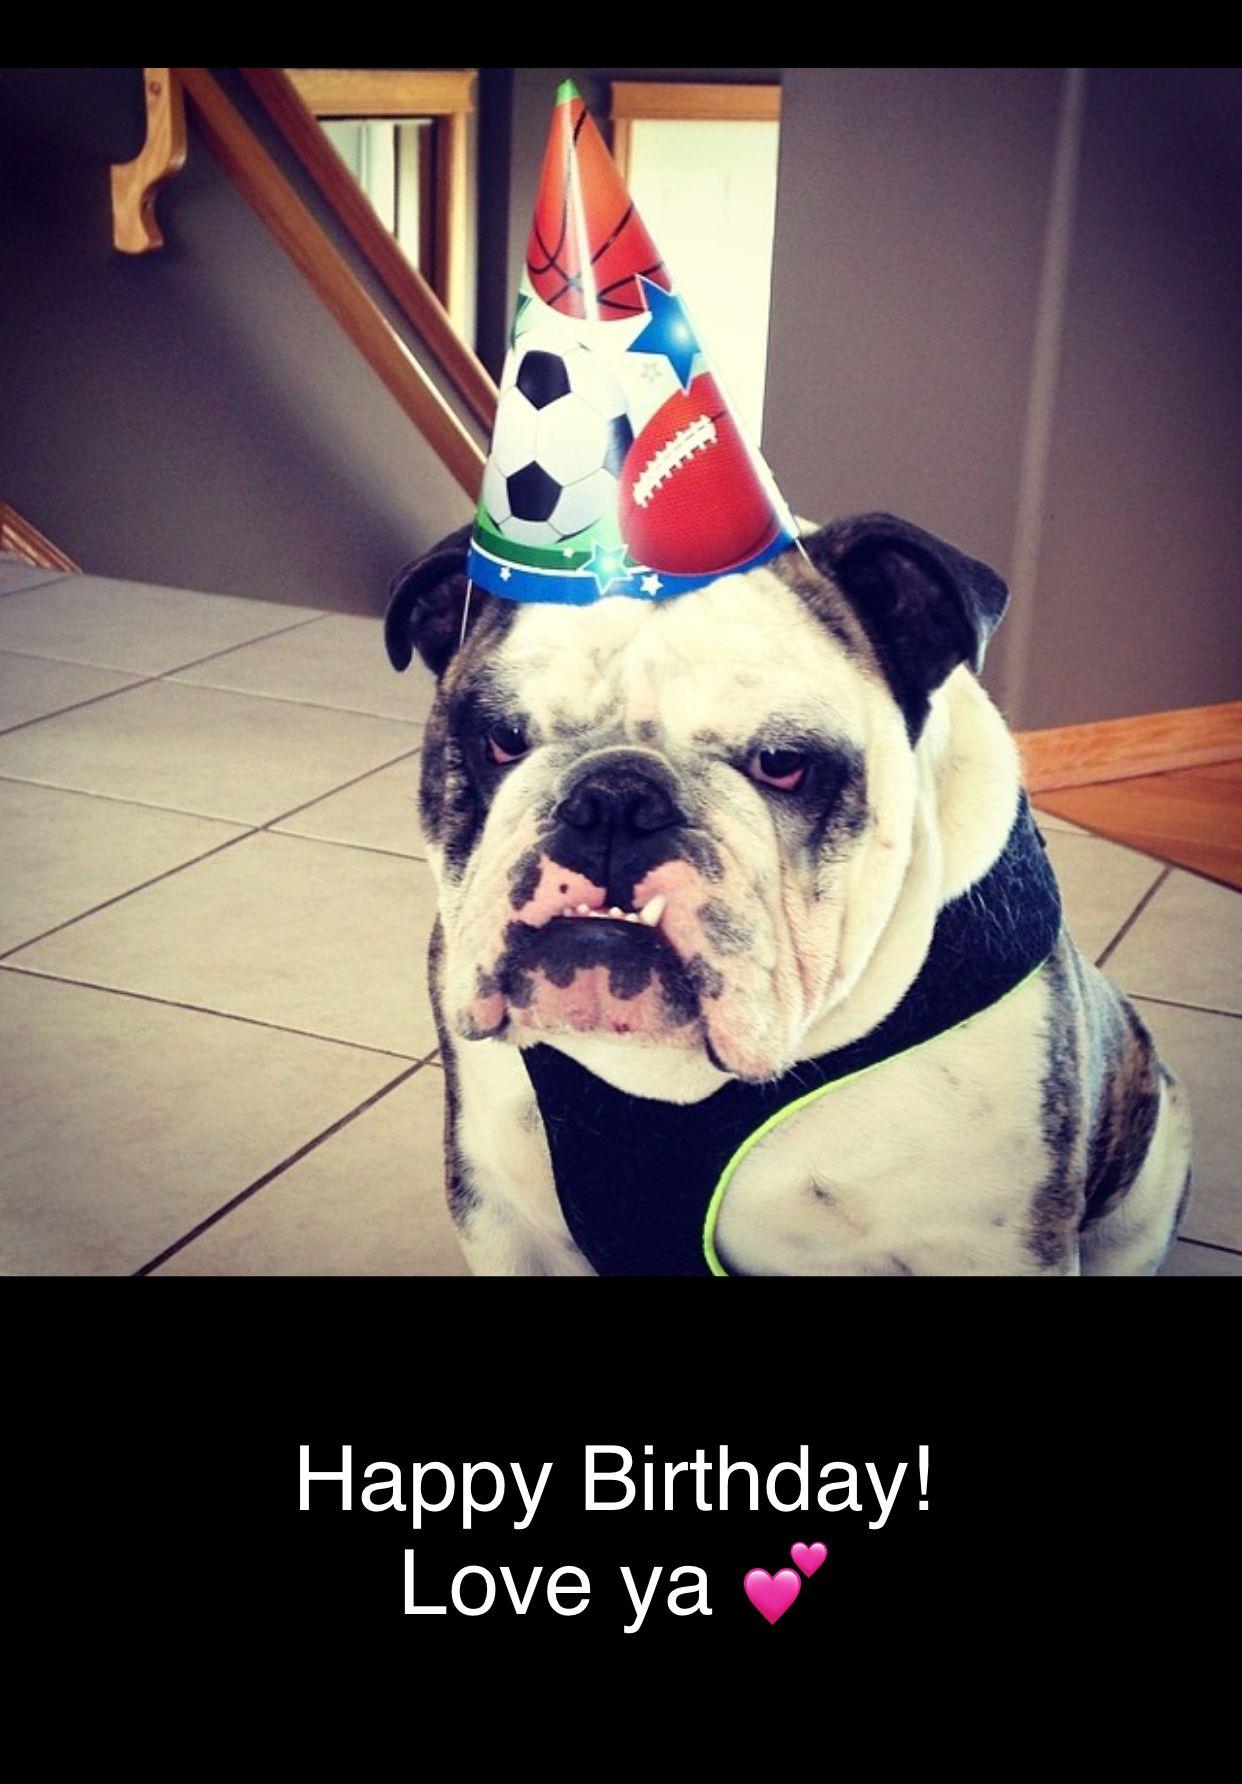 Pin By Candice May Martin On Birthday Memes Birthday Meme Happy Birthday French Bulldog